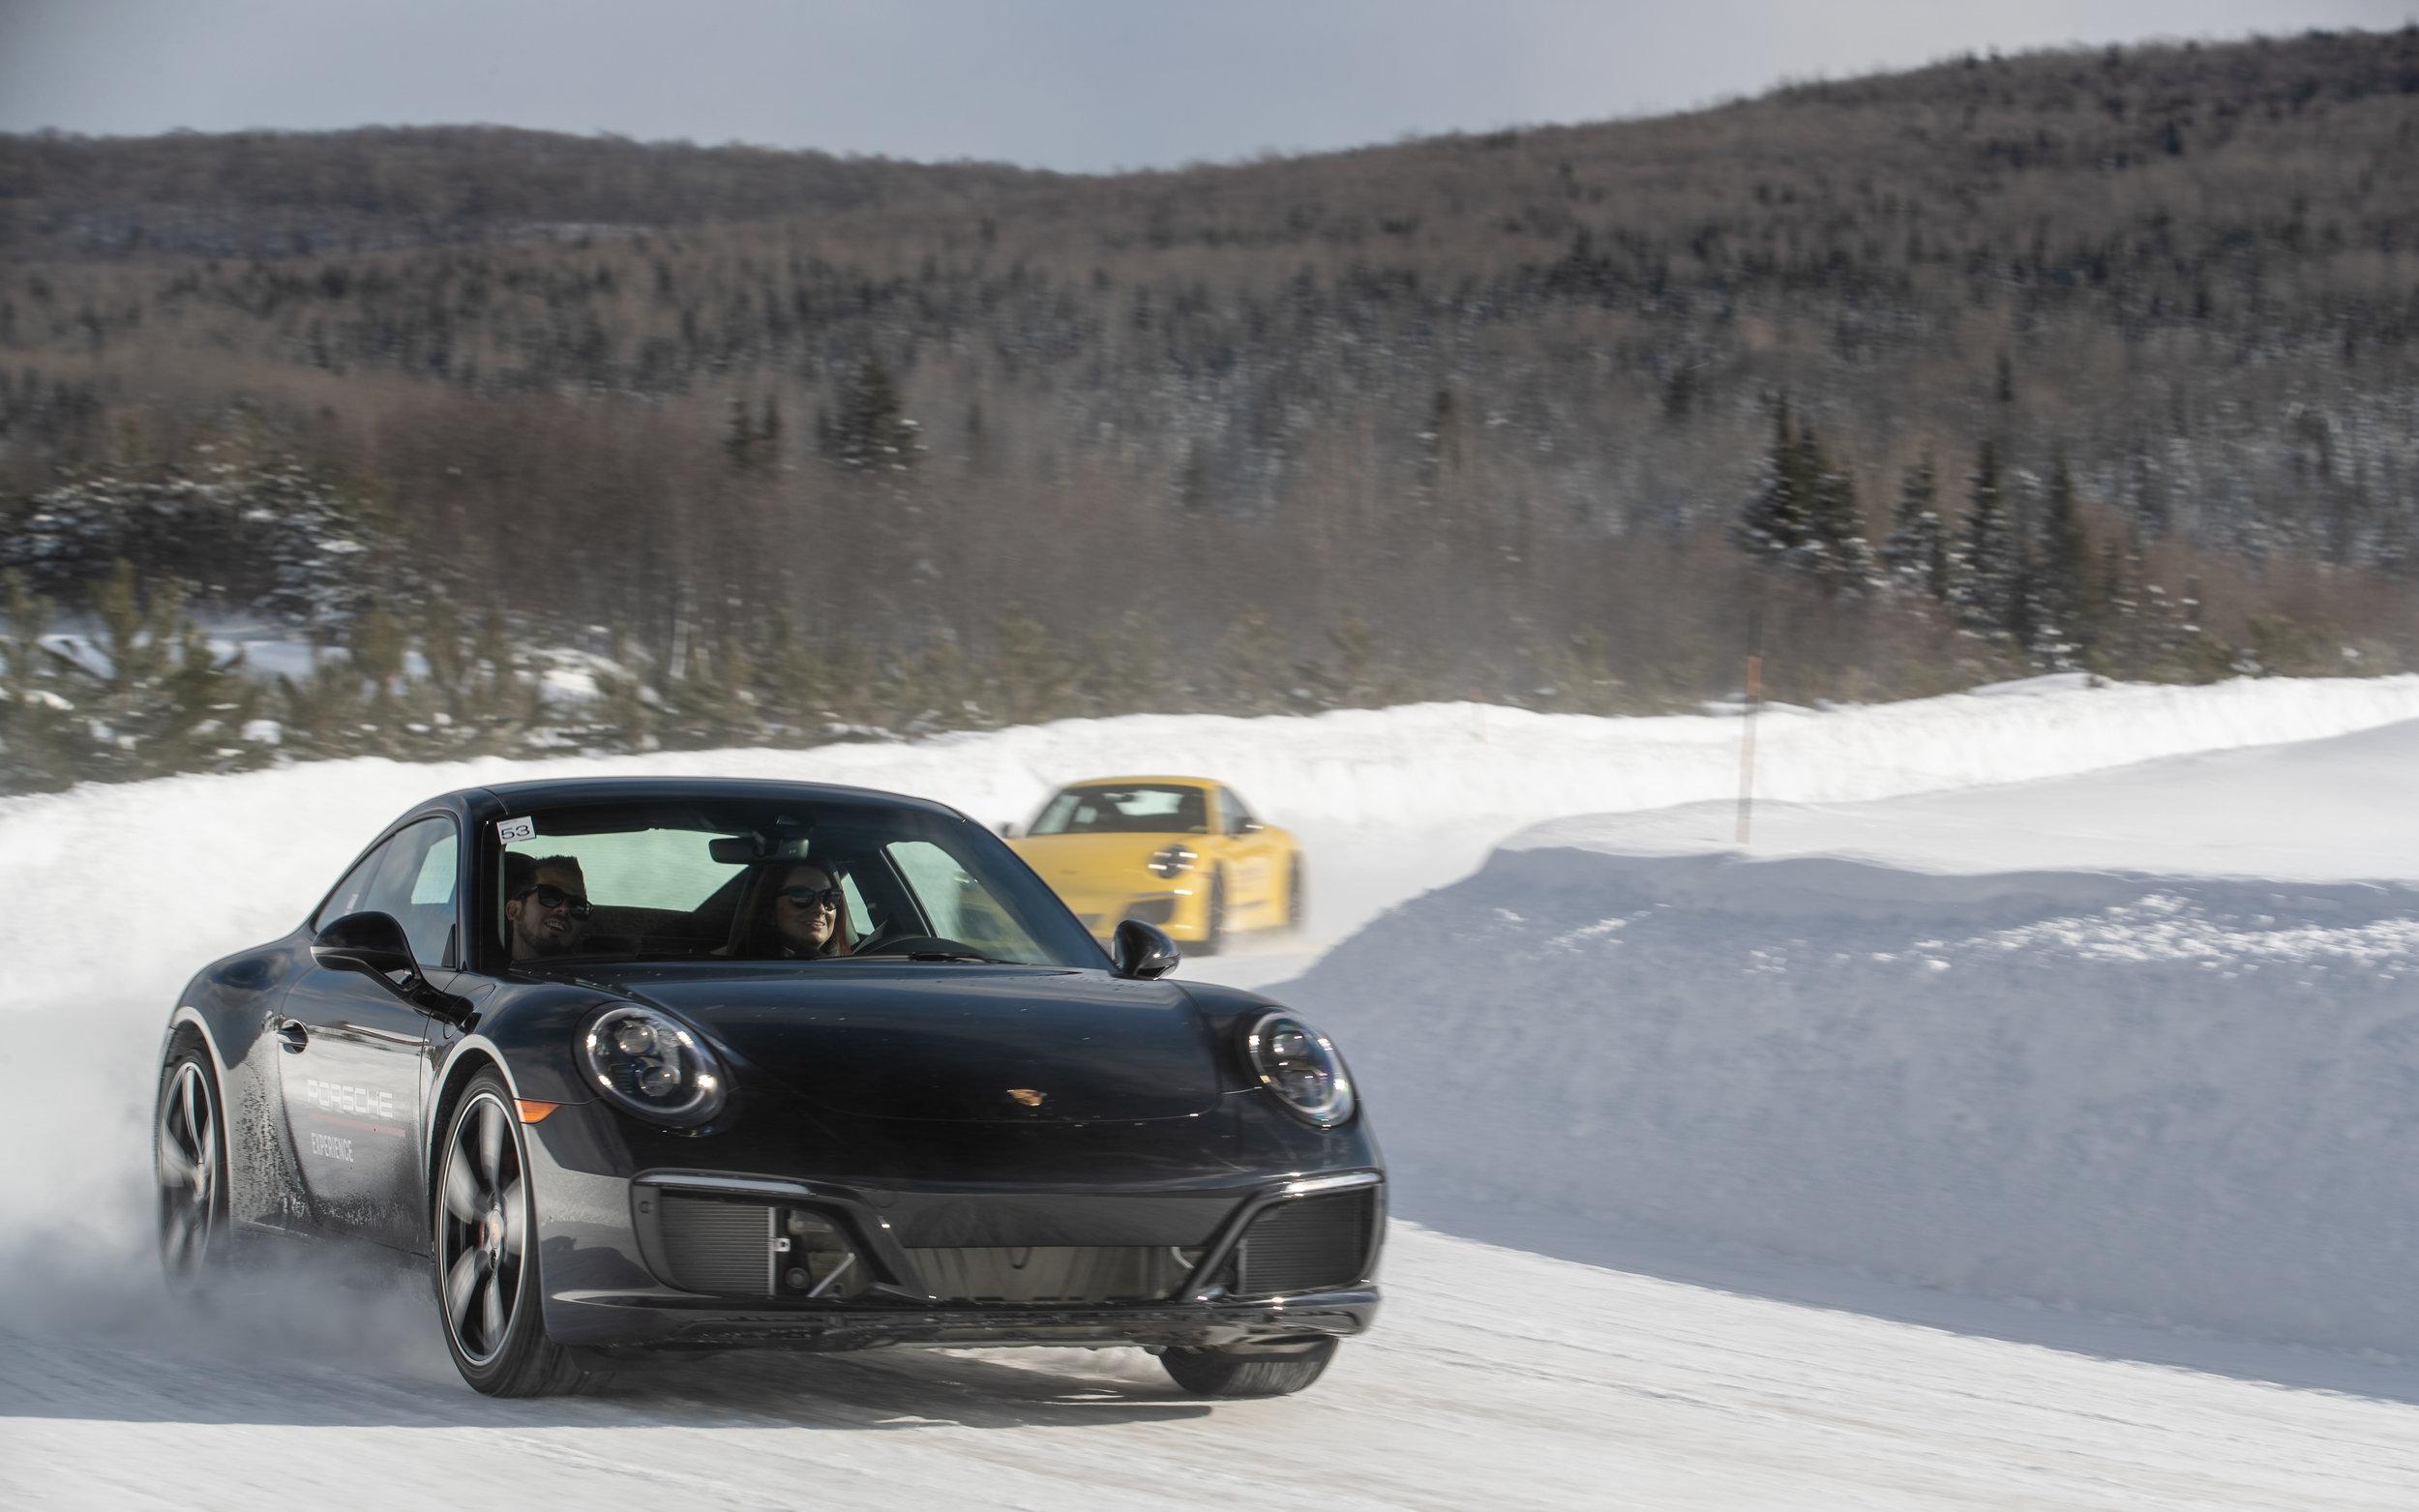 Porsche-Ice-Experience-Canada-Media-121.jpg